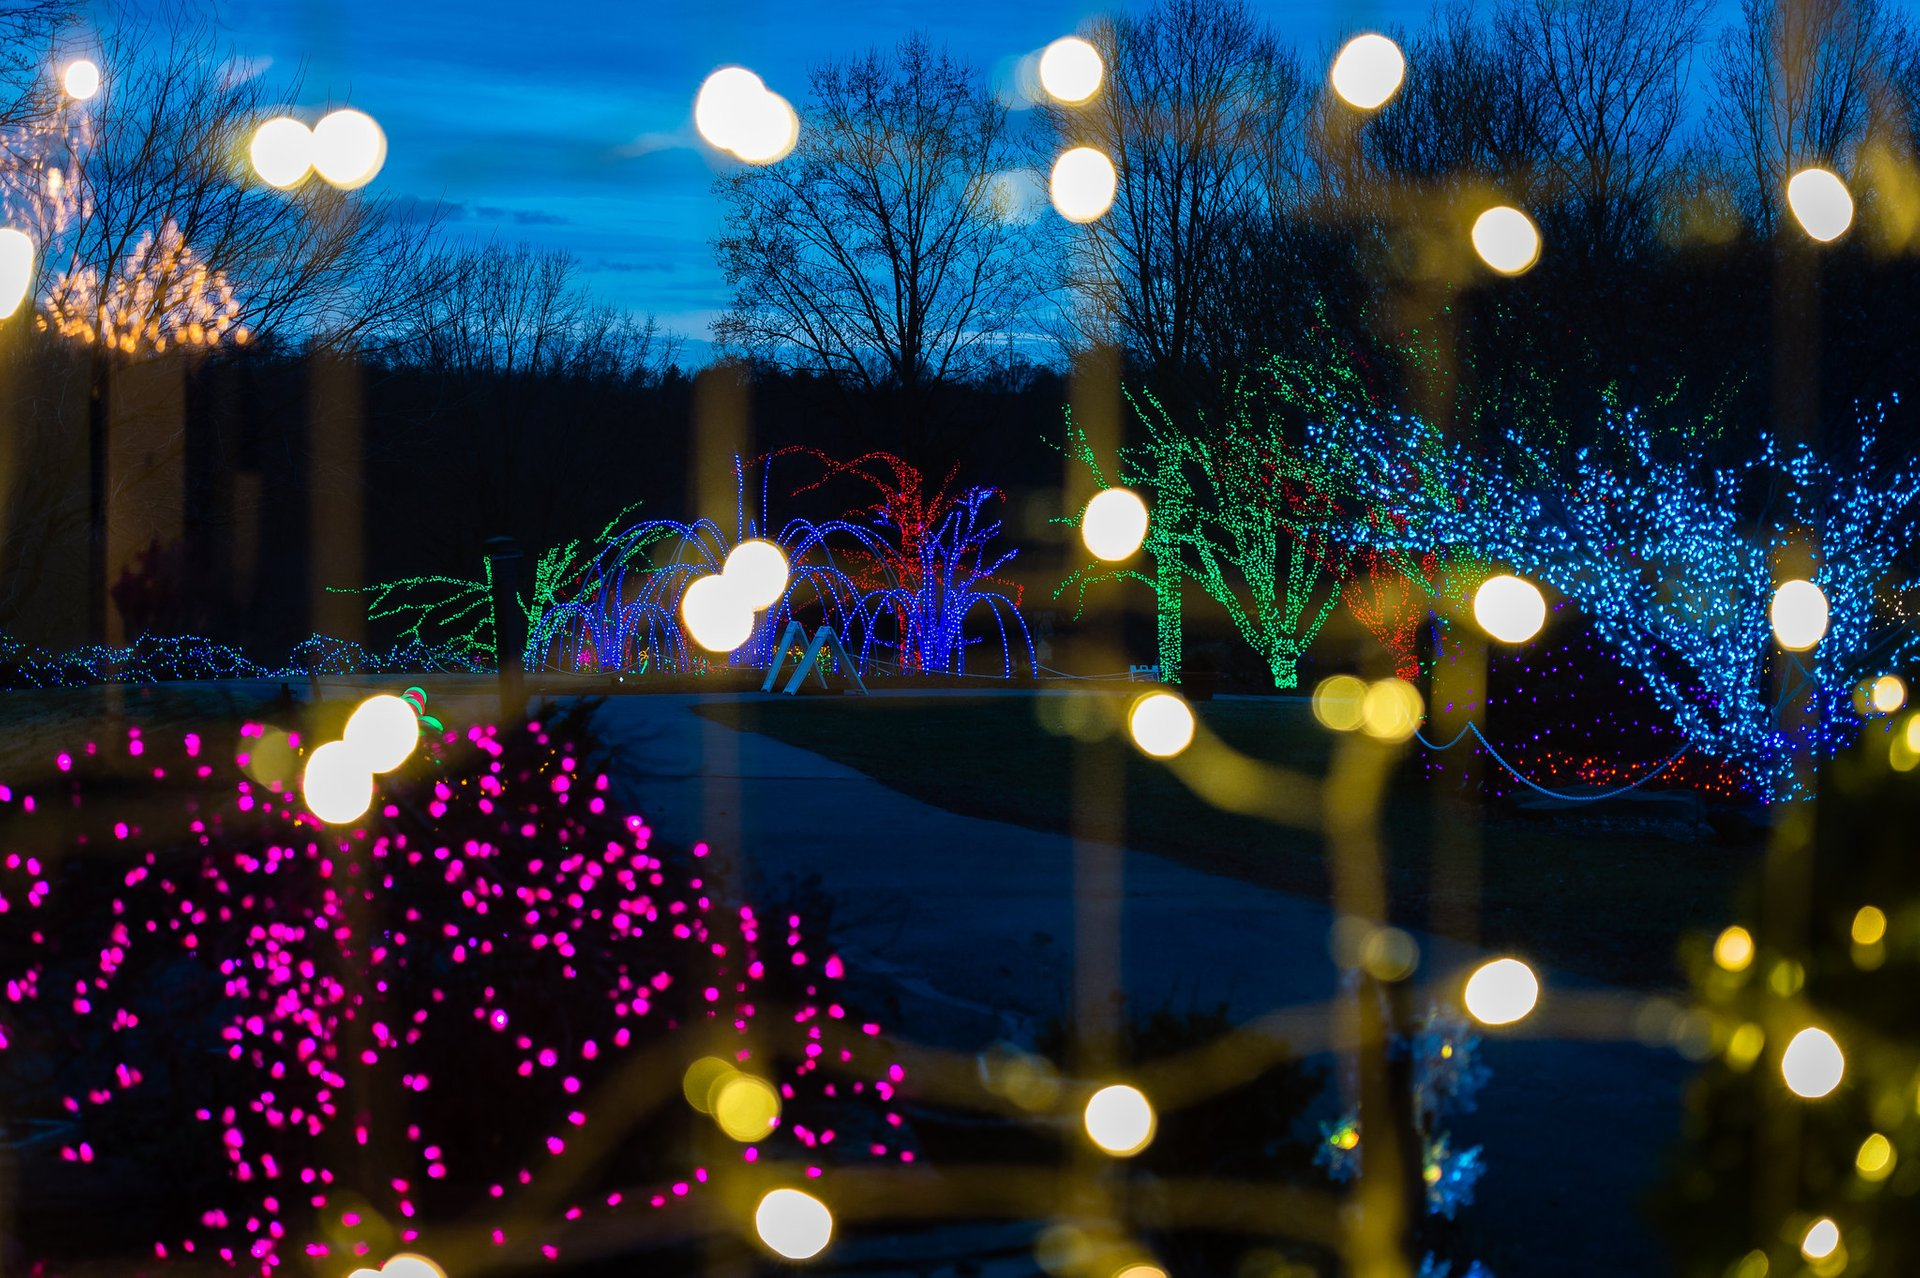 Christmas Lights across Virginia in Virginia 2020 - Best Time